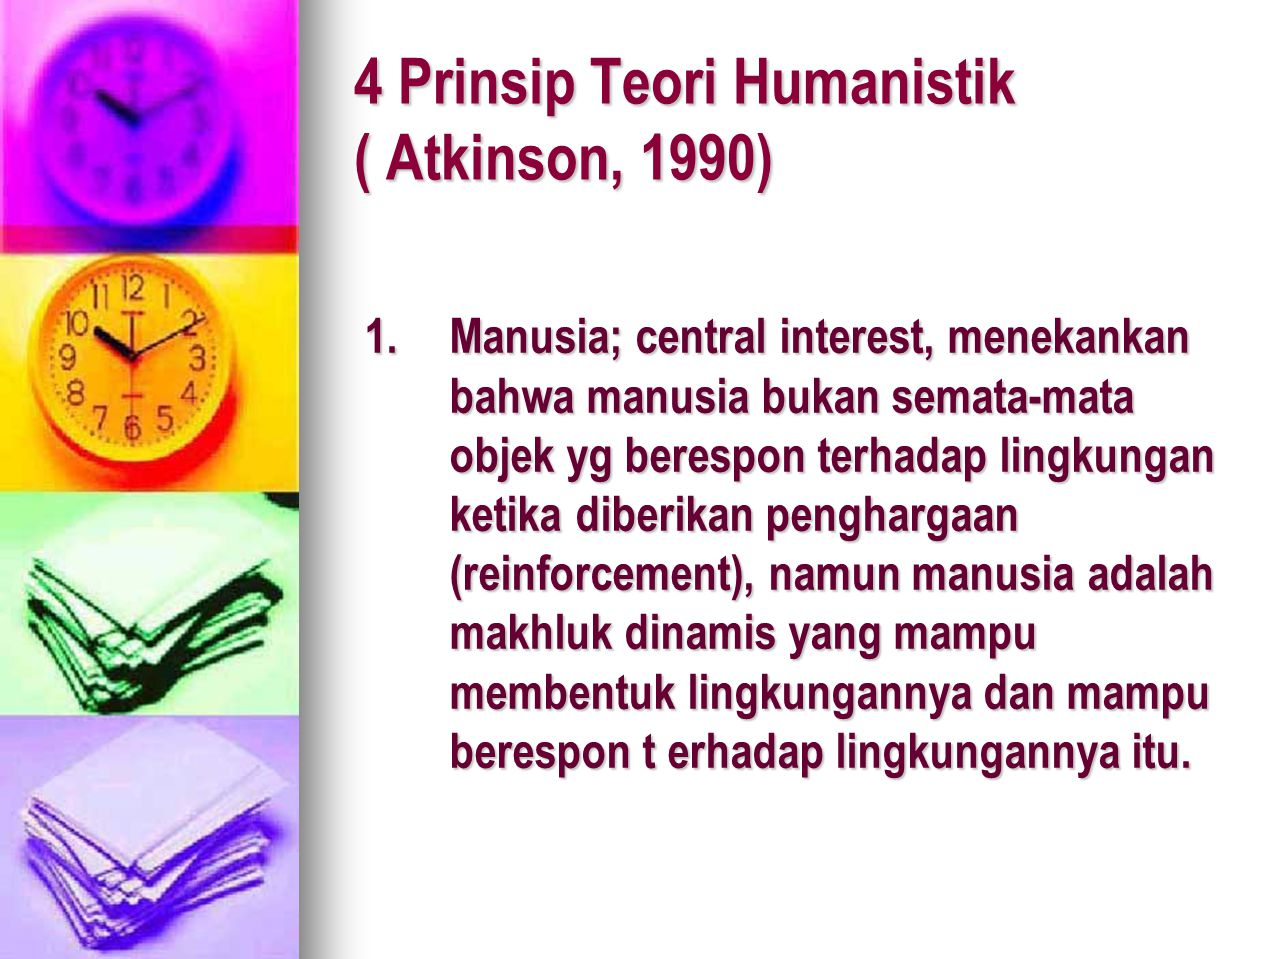 4 Prinsip Teori Humanistik ( Atkinson, 1990)